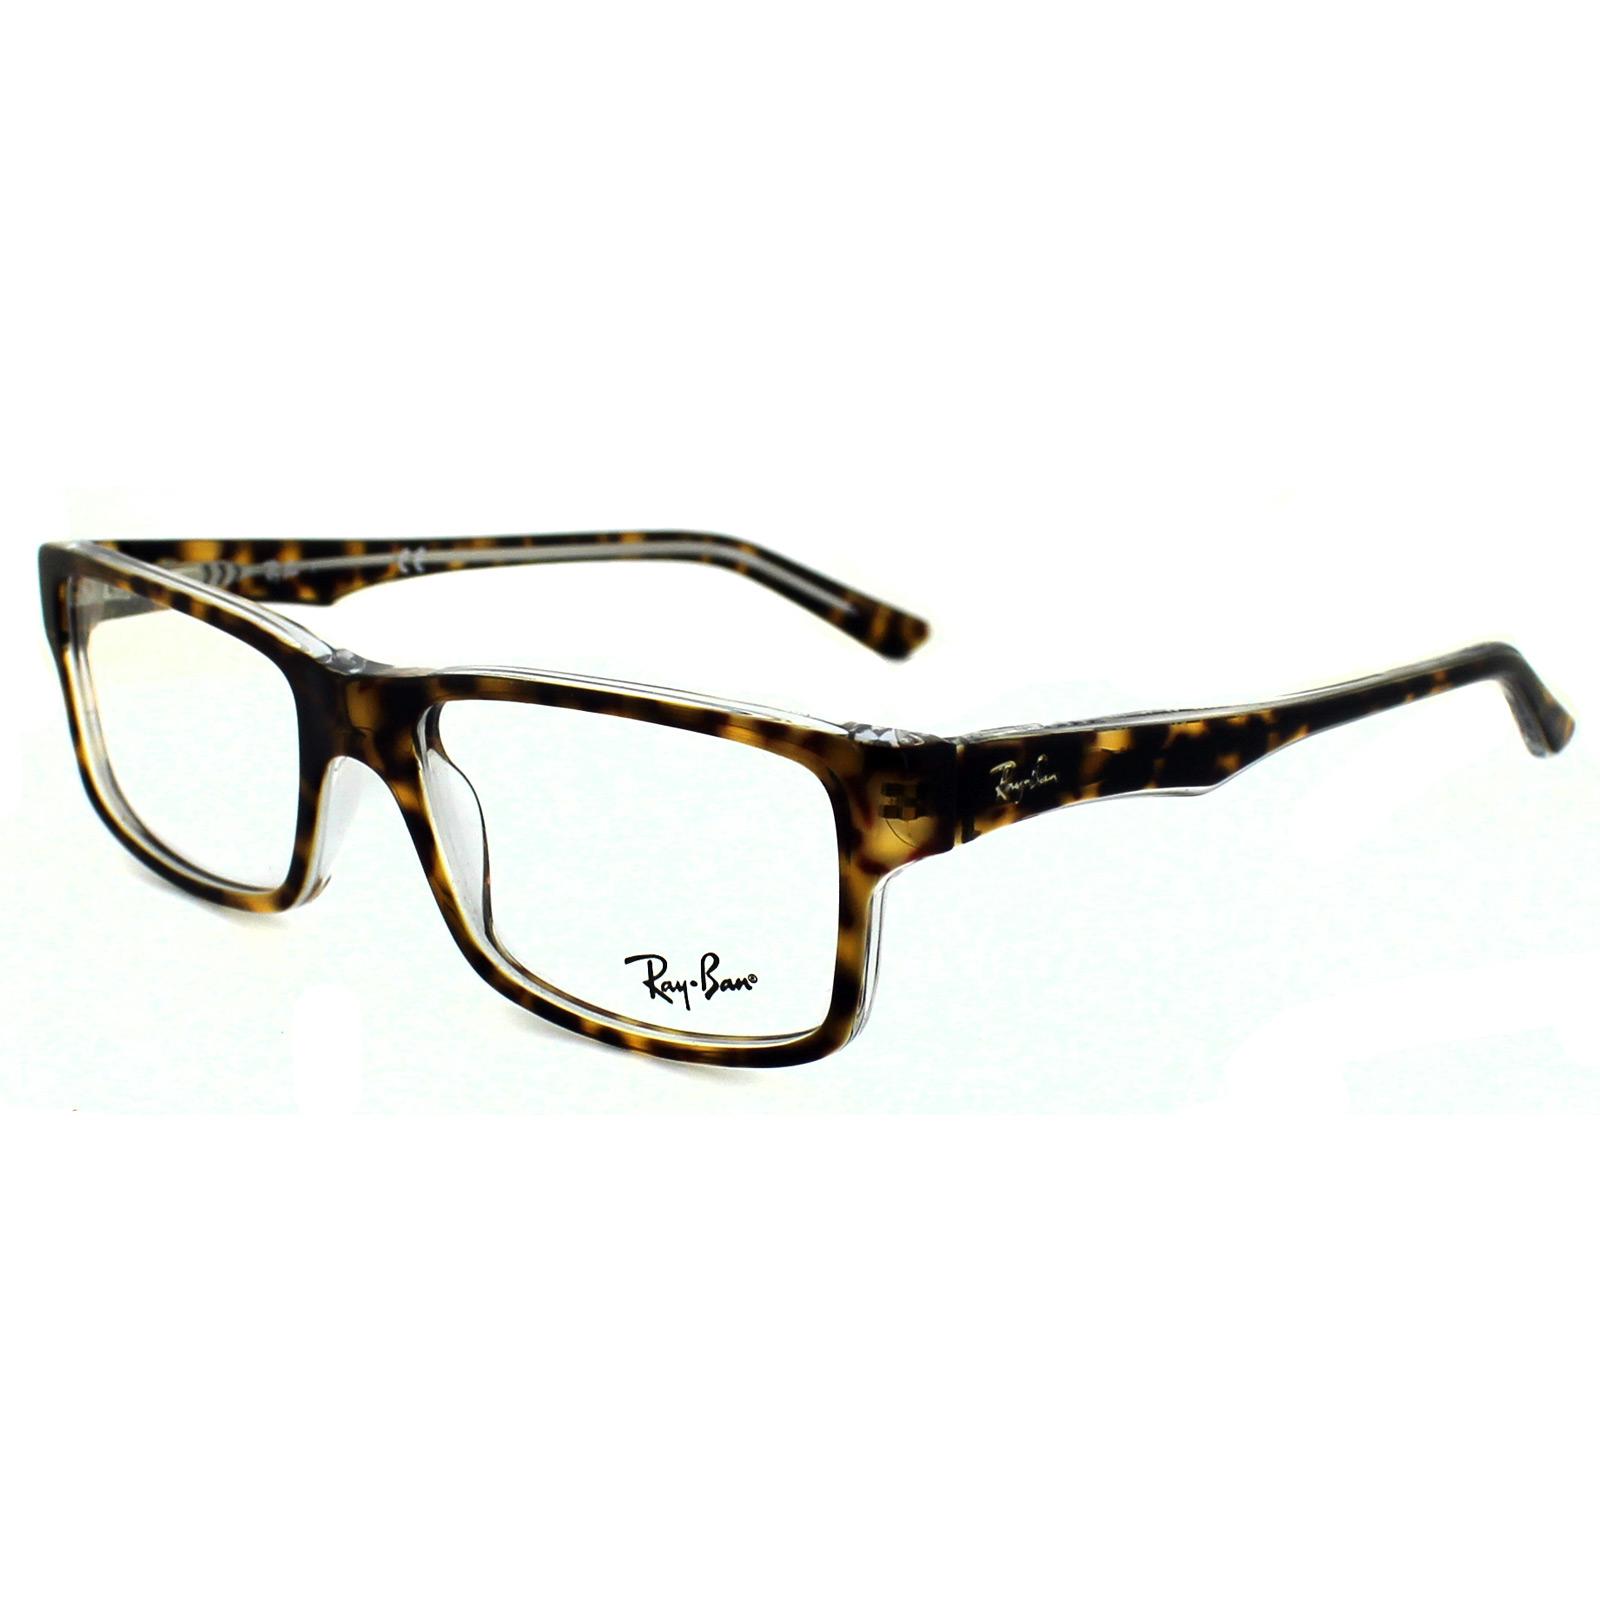 ray ban brillengestell 5245 5082 top havana on transparent. Black Bedroom Furniture Sets. Home Design Ideas